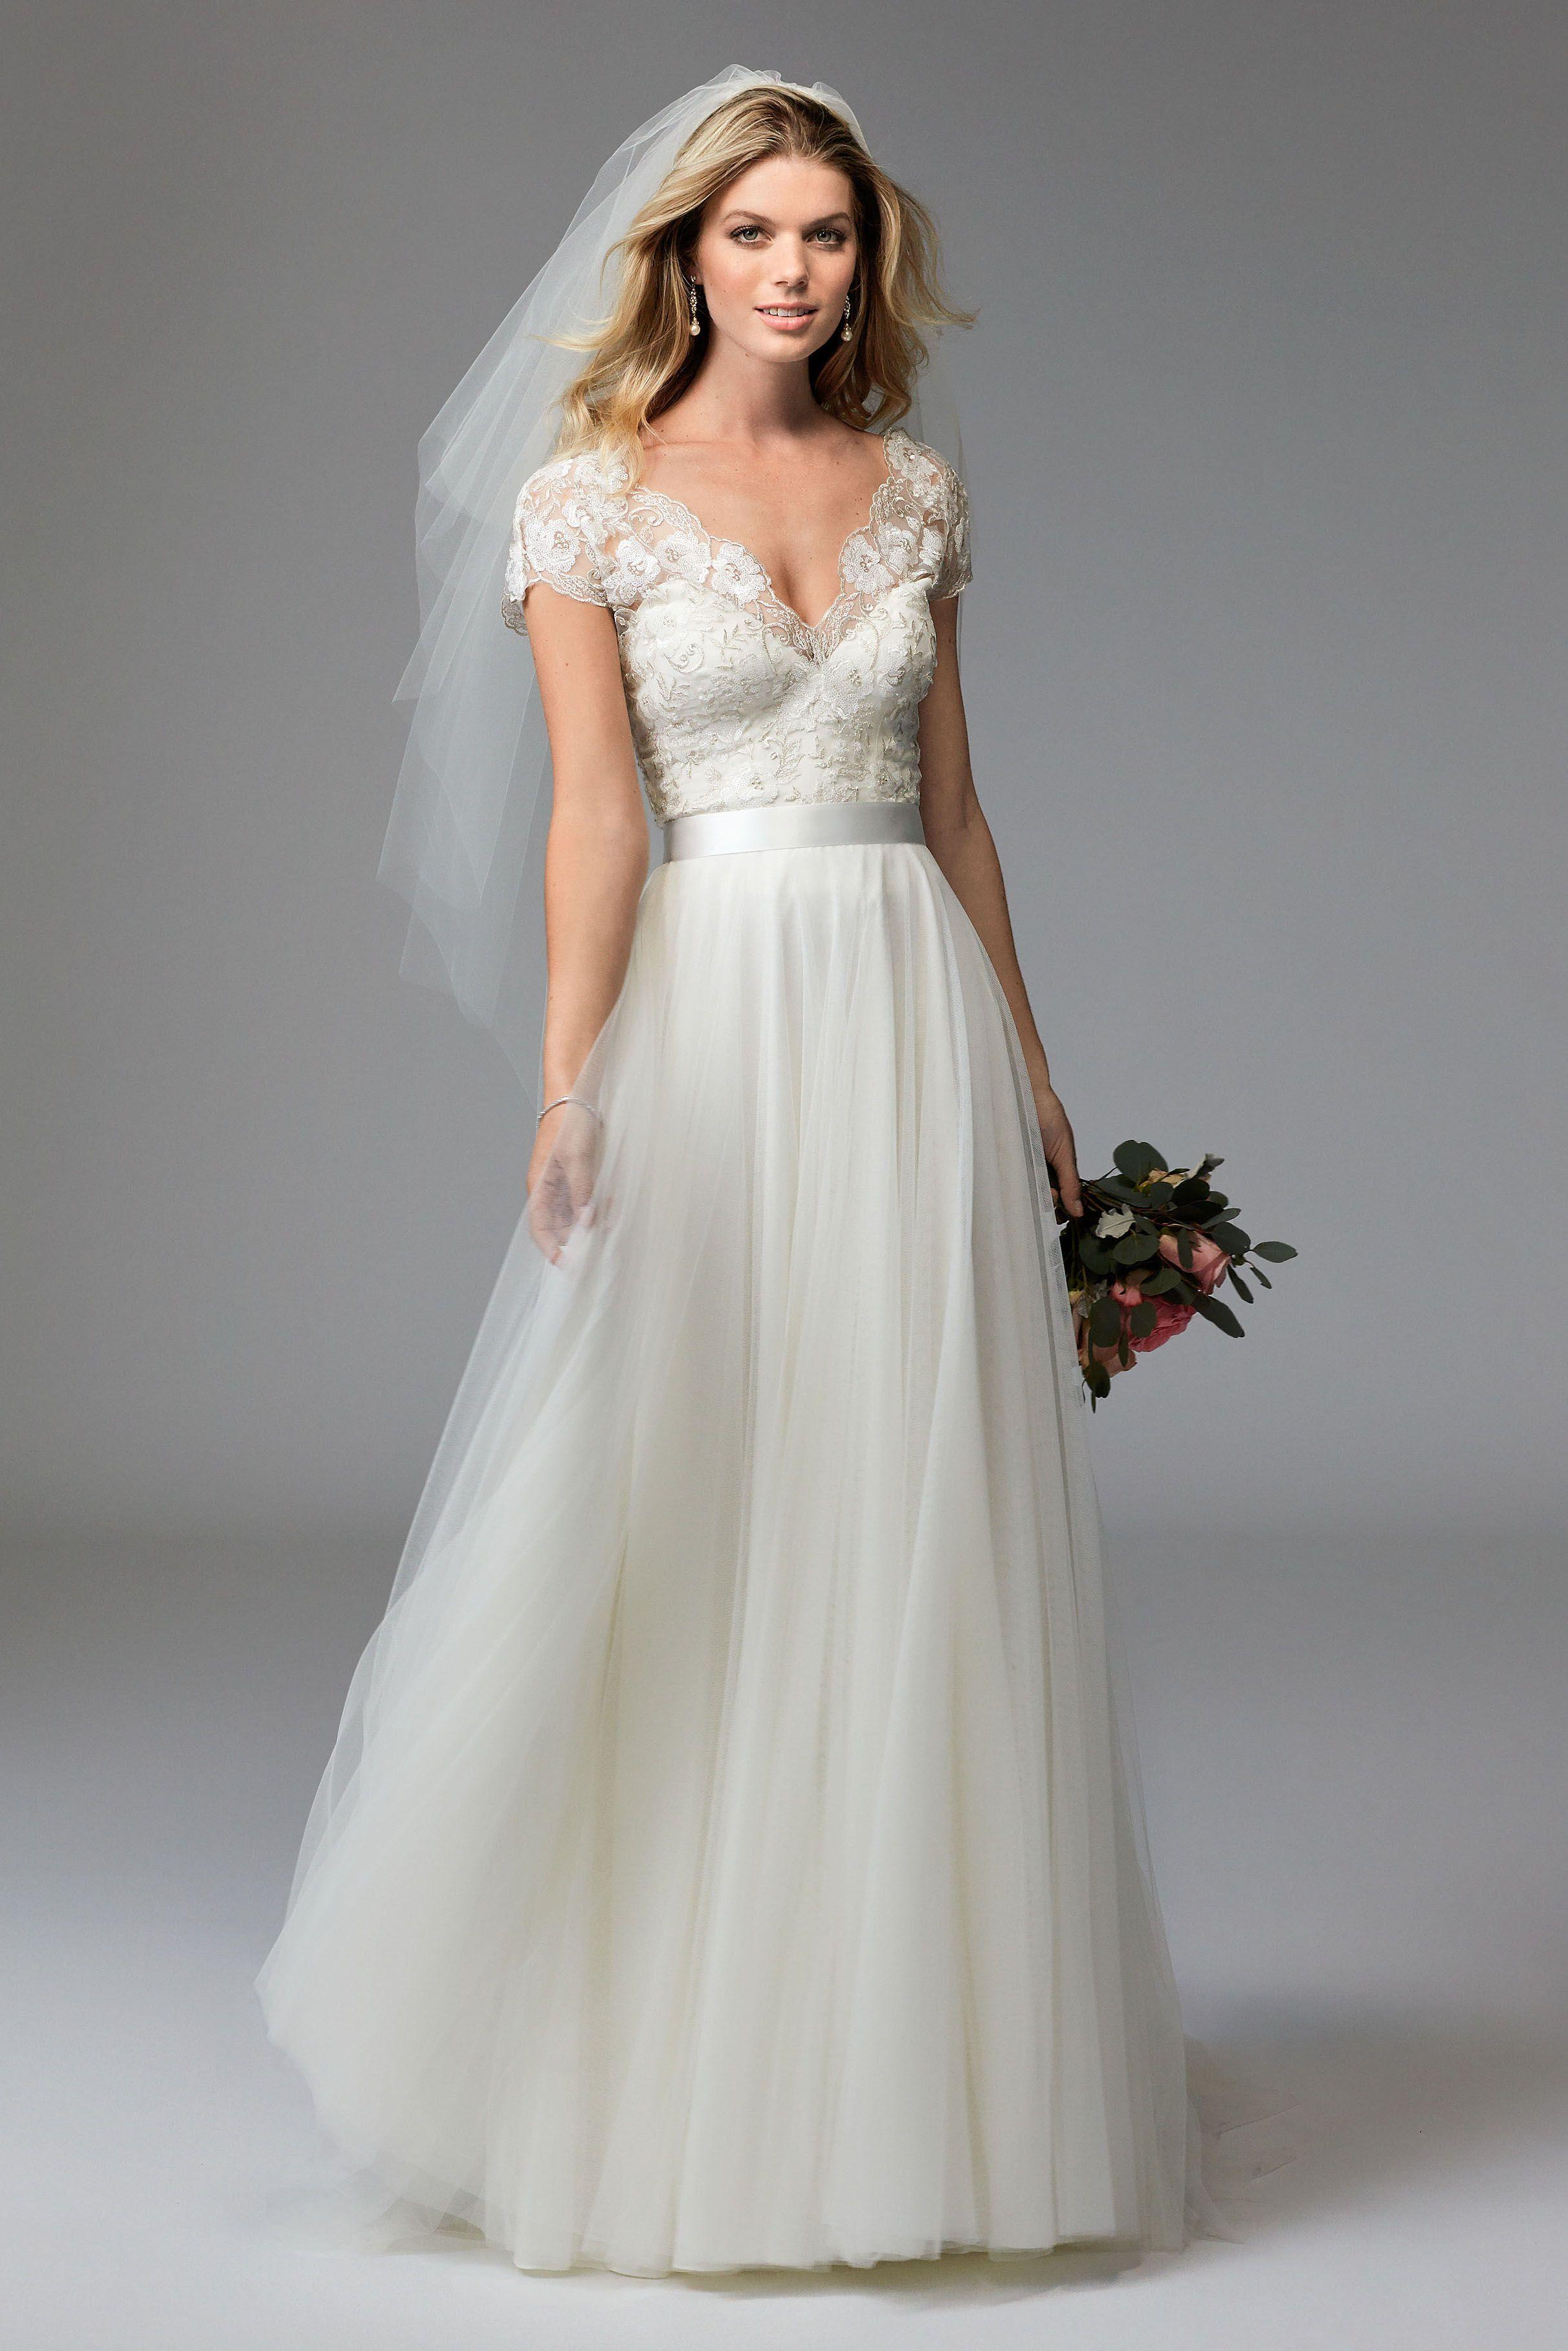 Charisma star wedding dresses